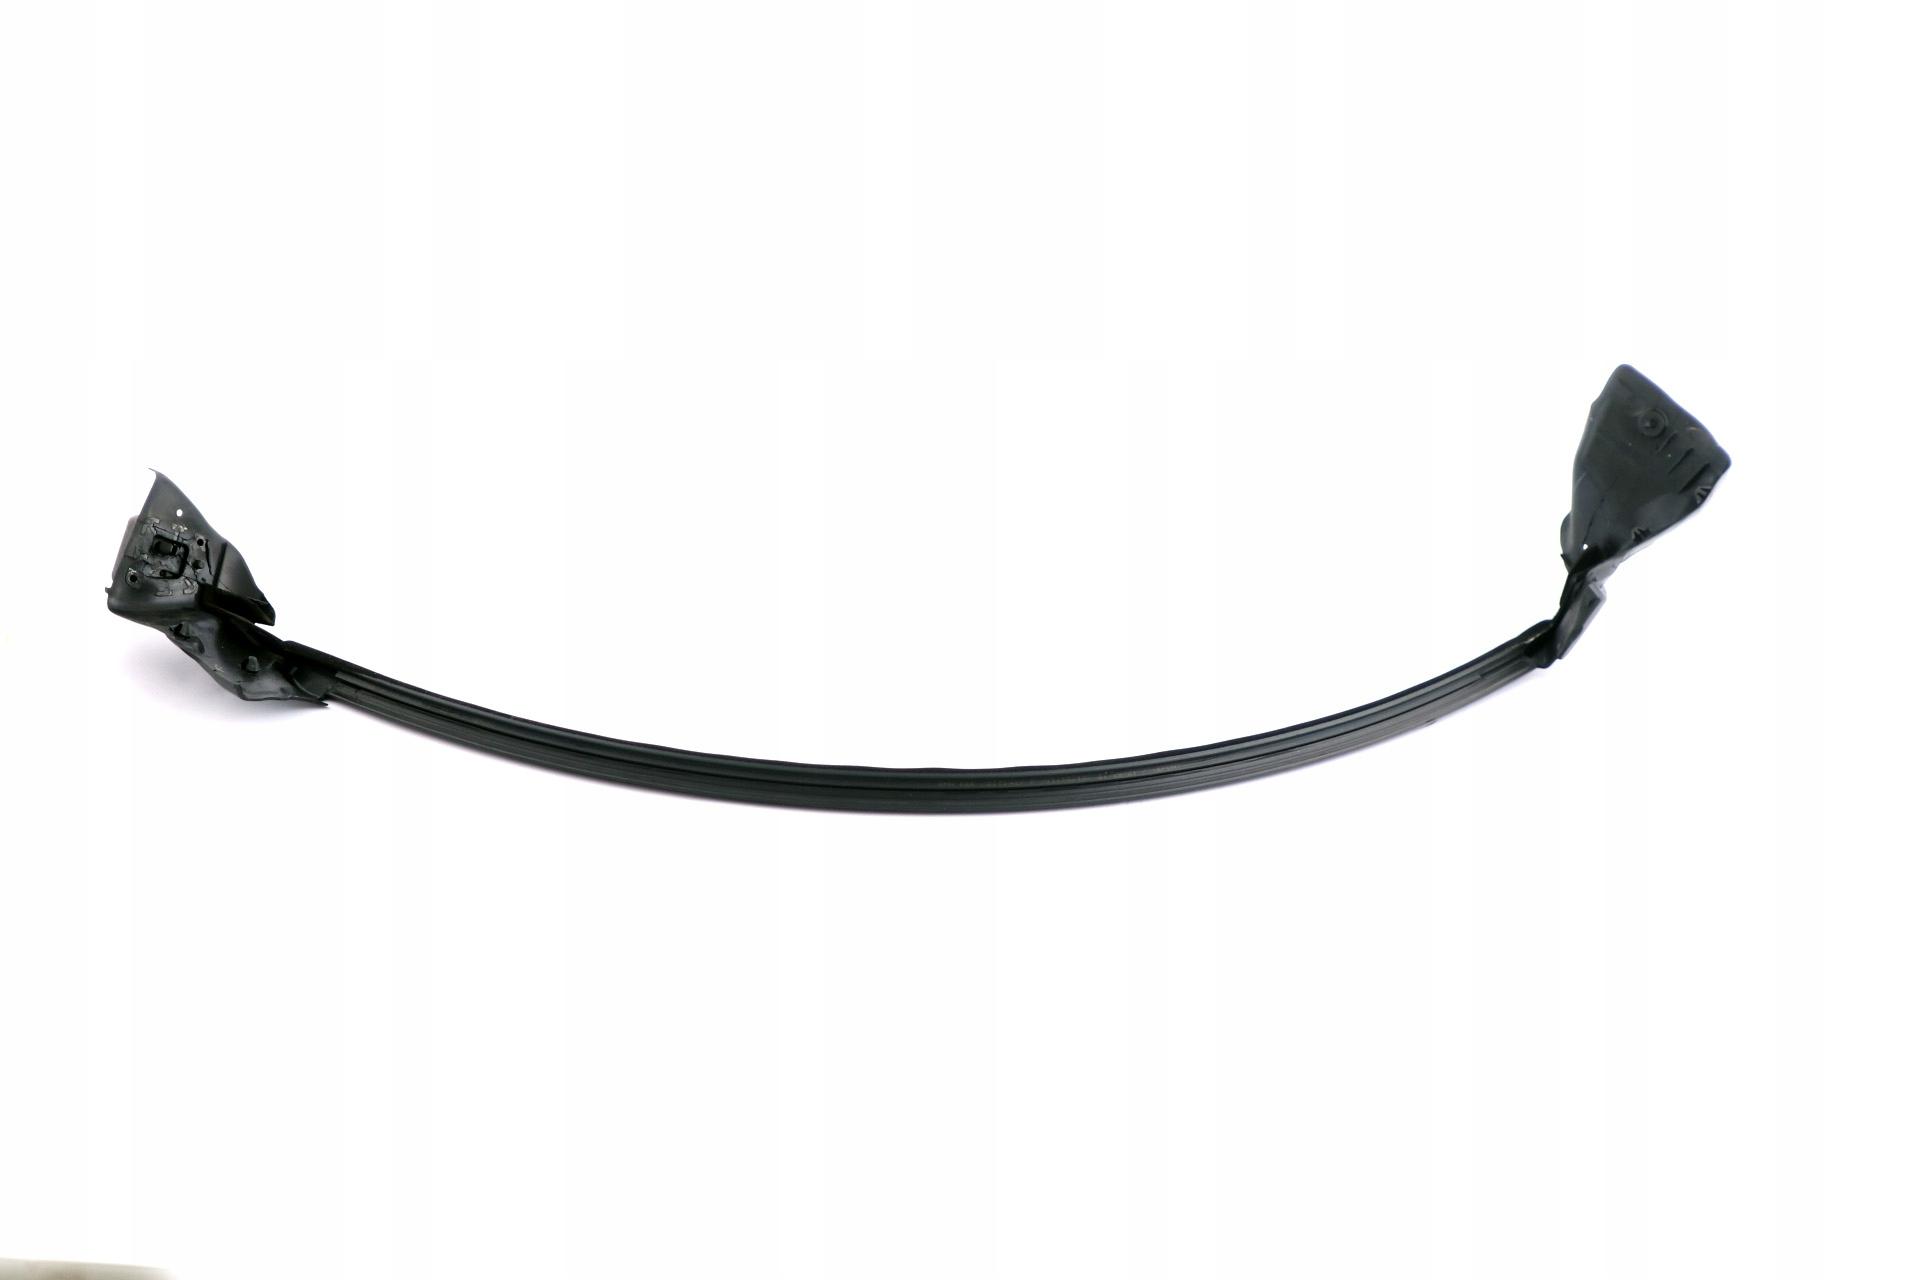 MINI R56 Прокладка рейка двери стекла левая